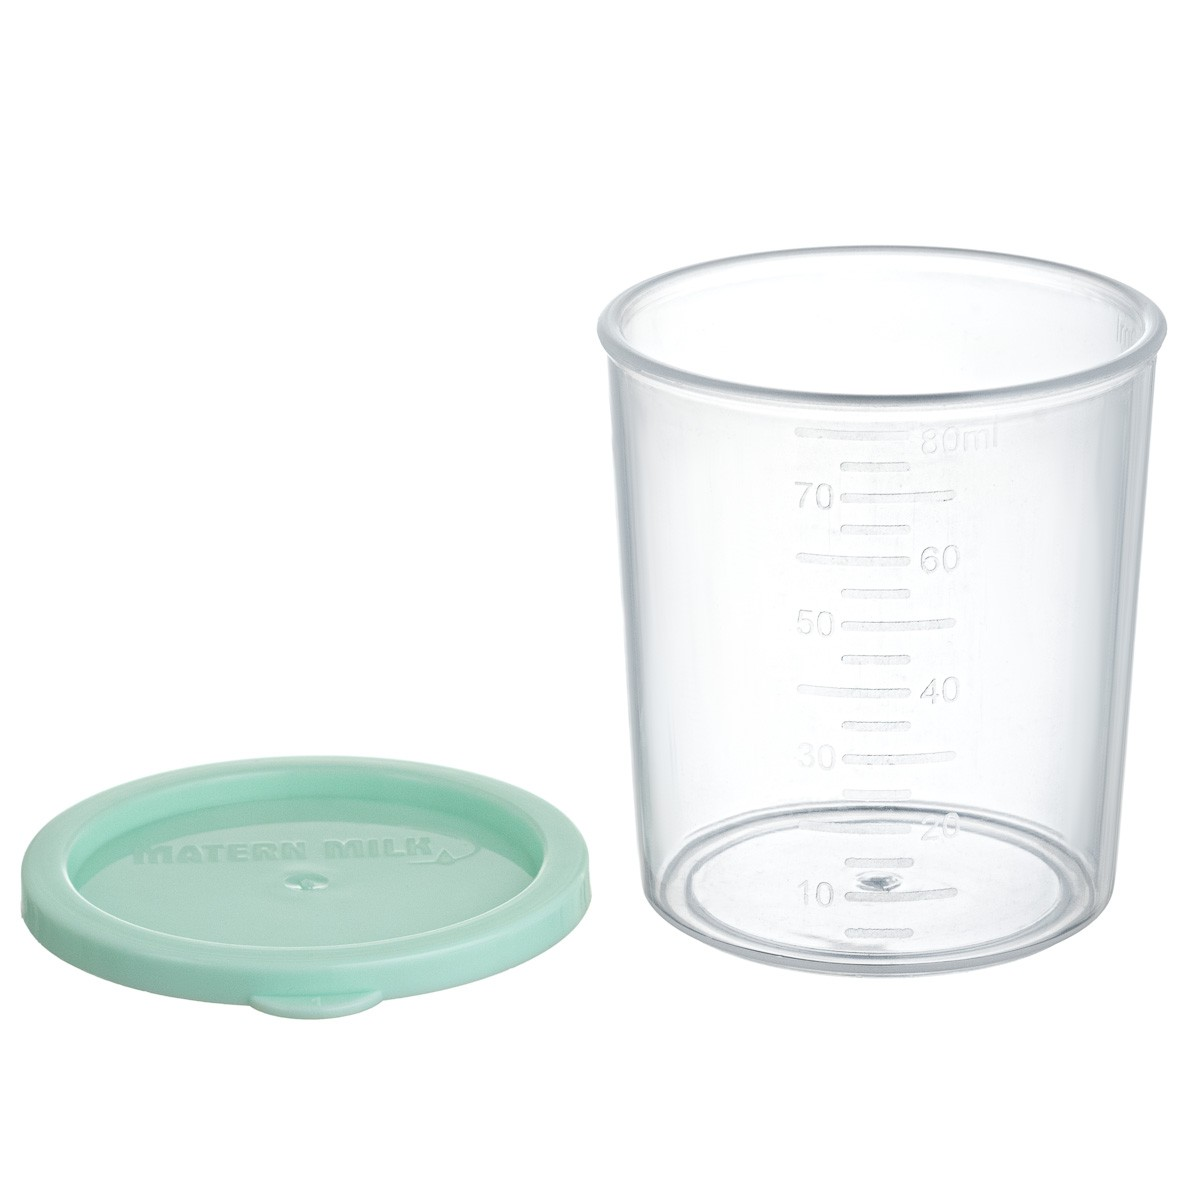 Kit 100  Copos Para Armazenamento de Leite Materno - 80 ml  (a granel)  - Matern Milk